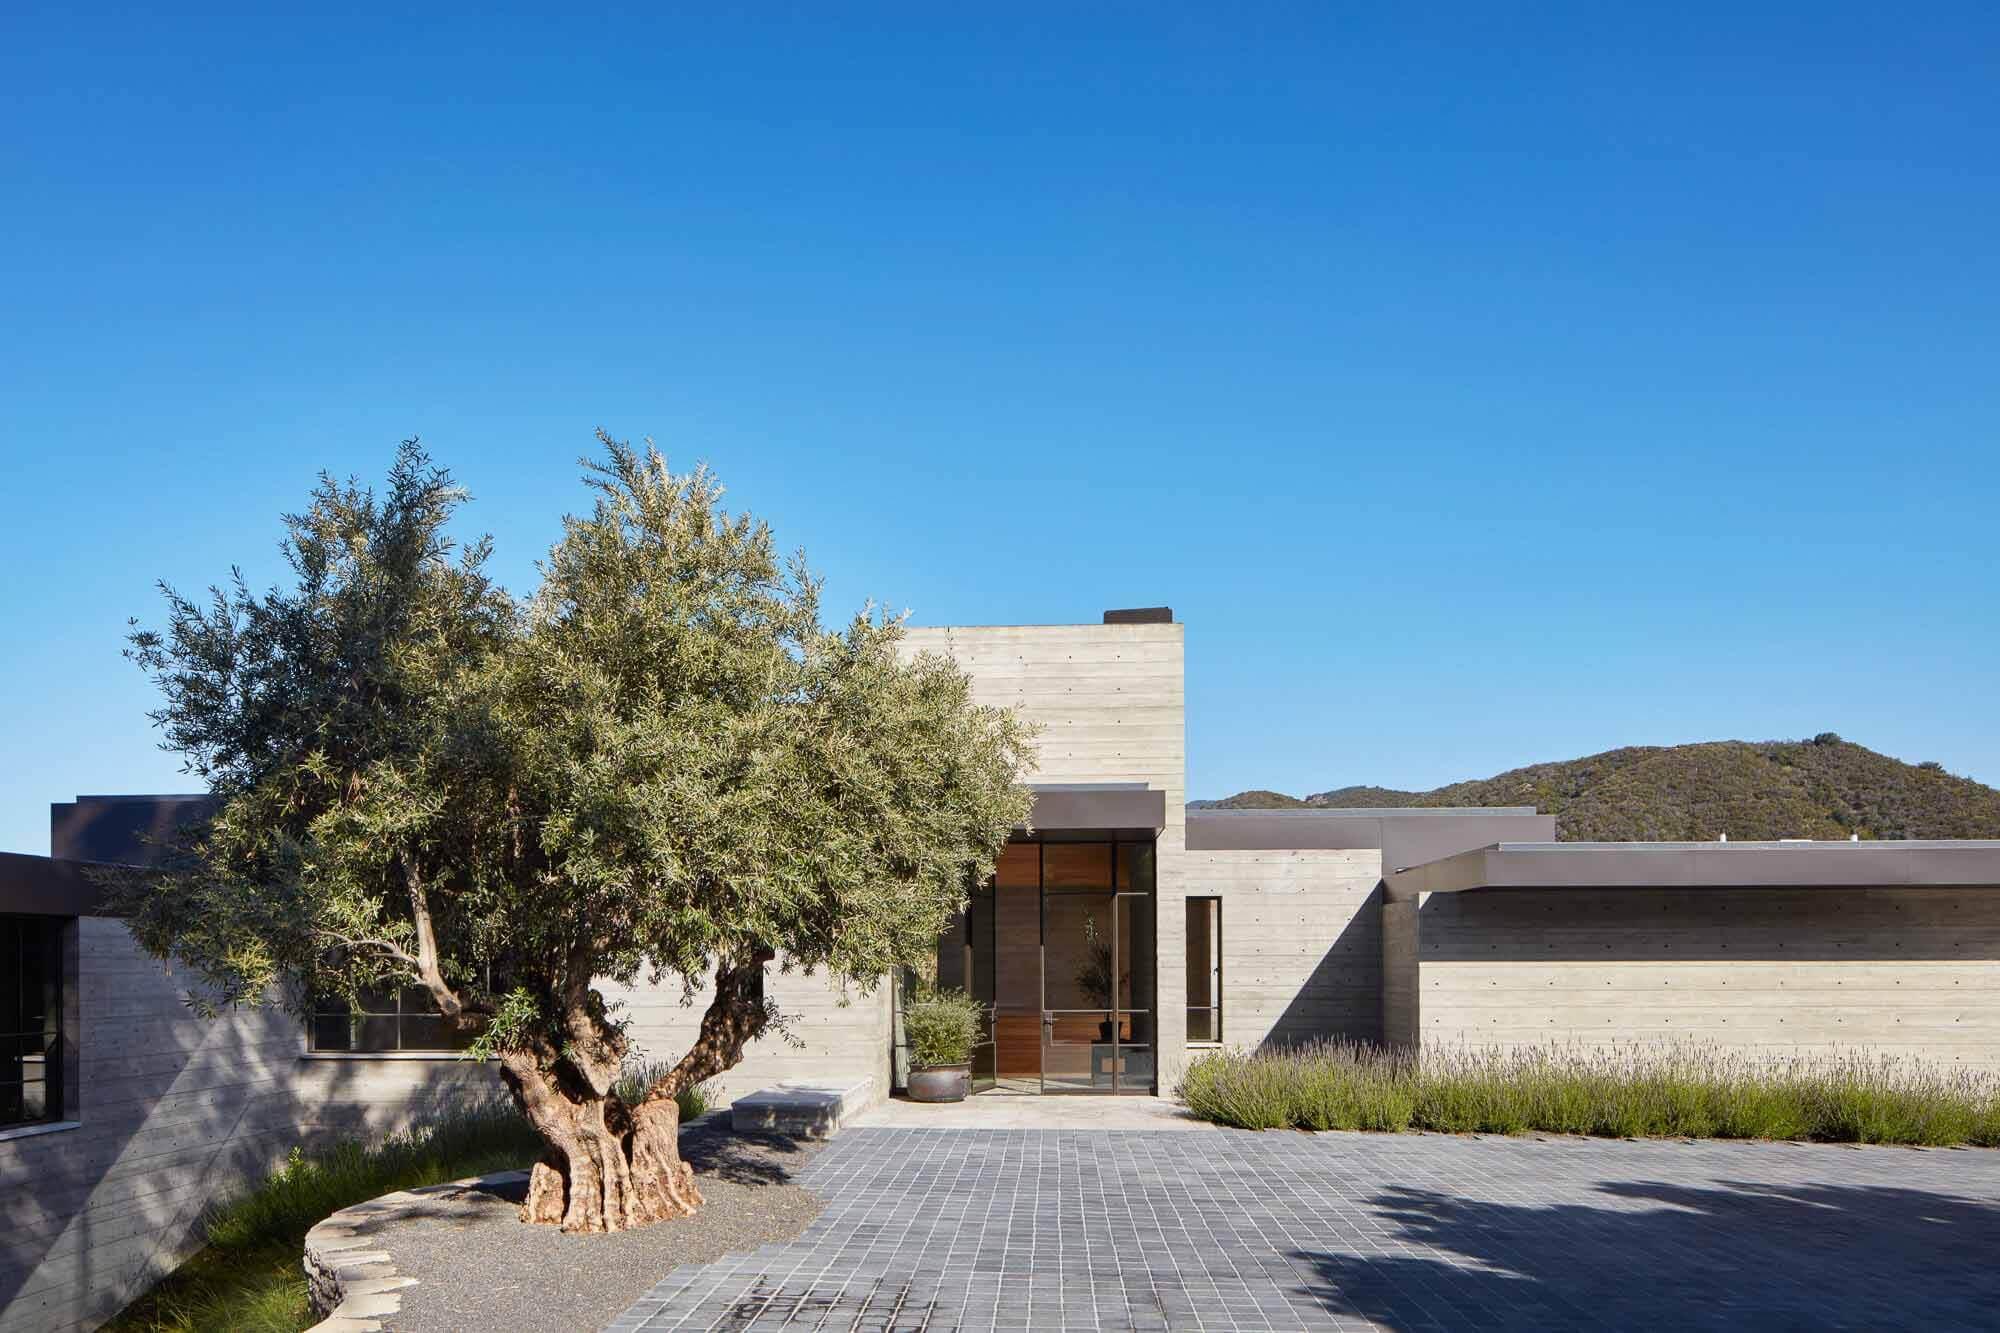 Дом на склоне холма для здорового образа жизни / Abramson Architects